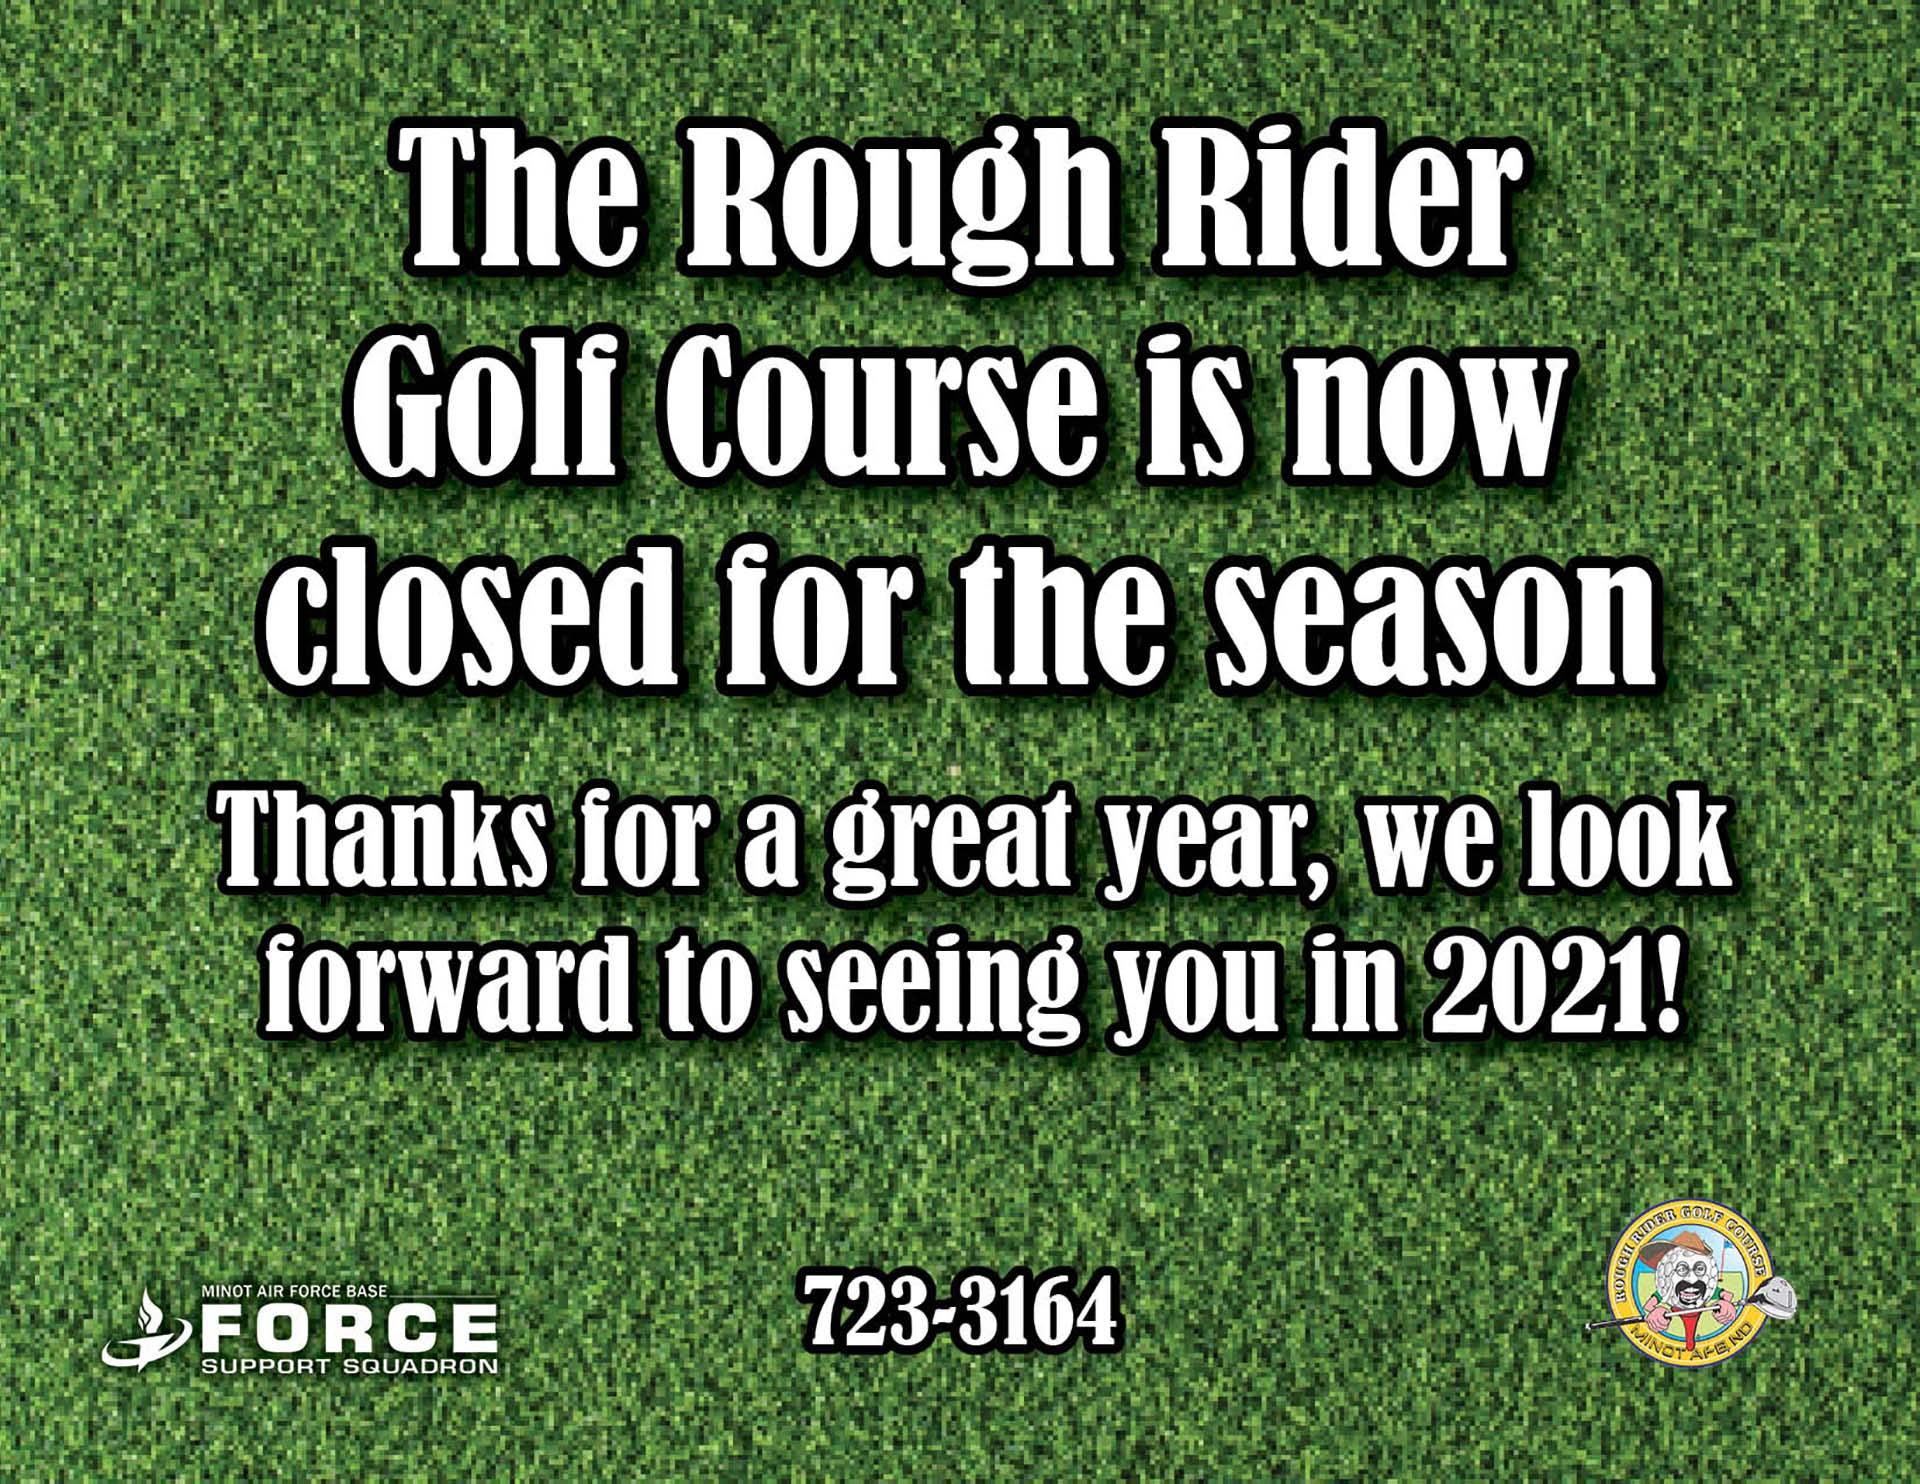 Golf Closed for season